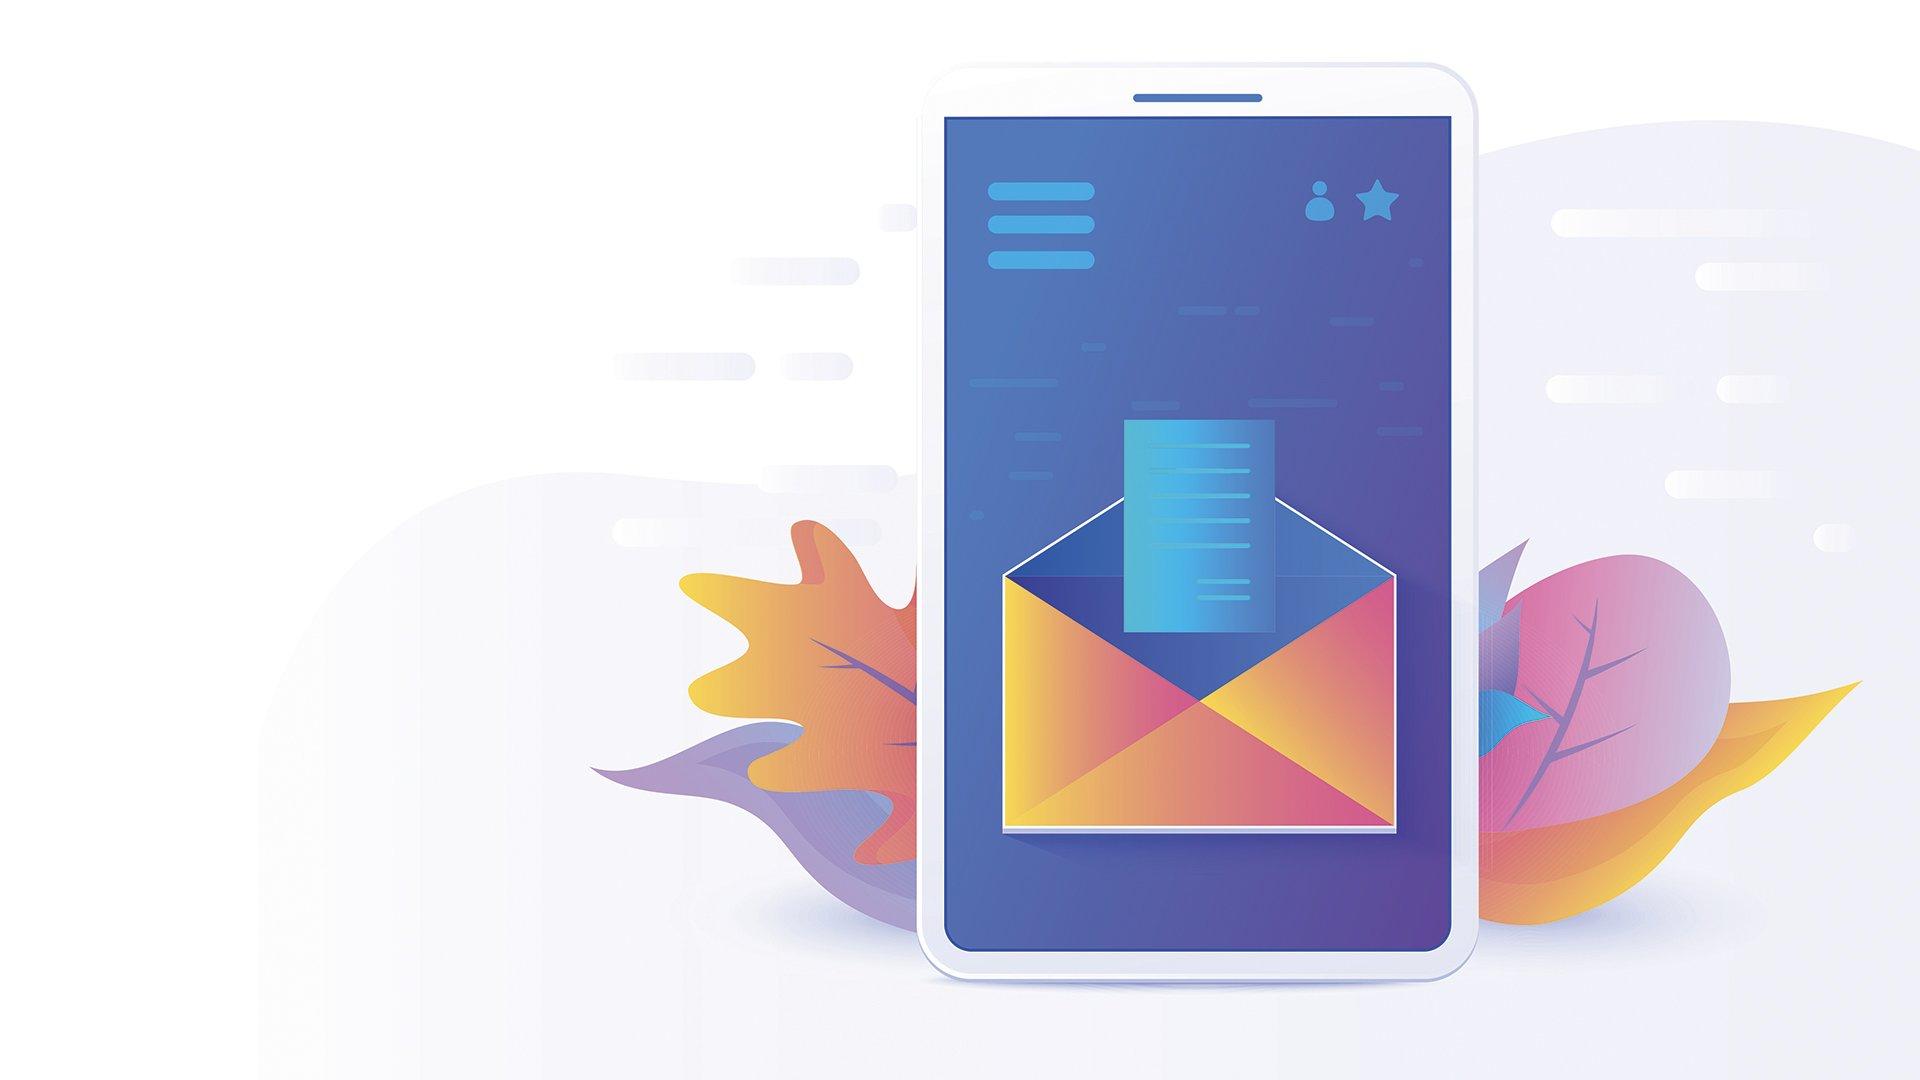 Loomen - Ecommerce ed email marketing: chiedere una recensione